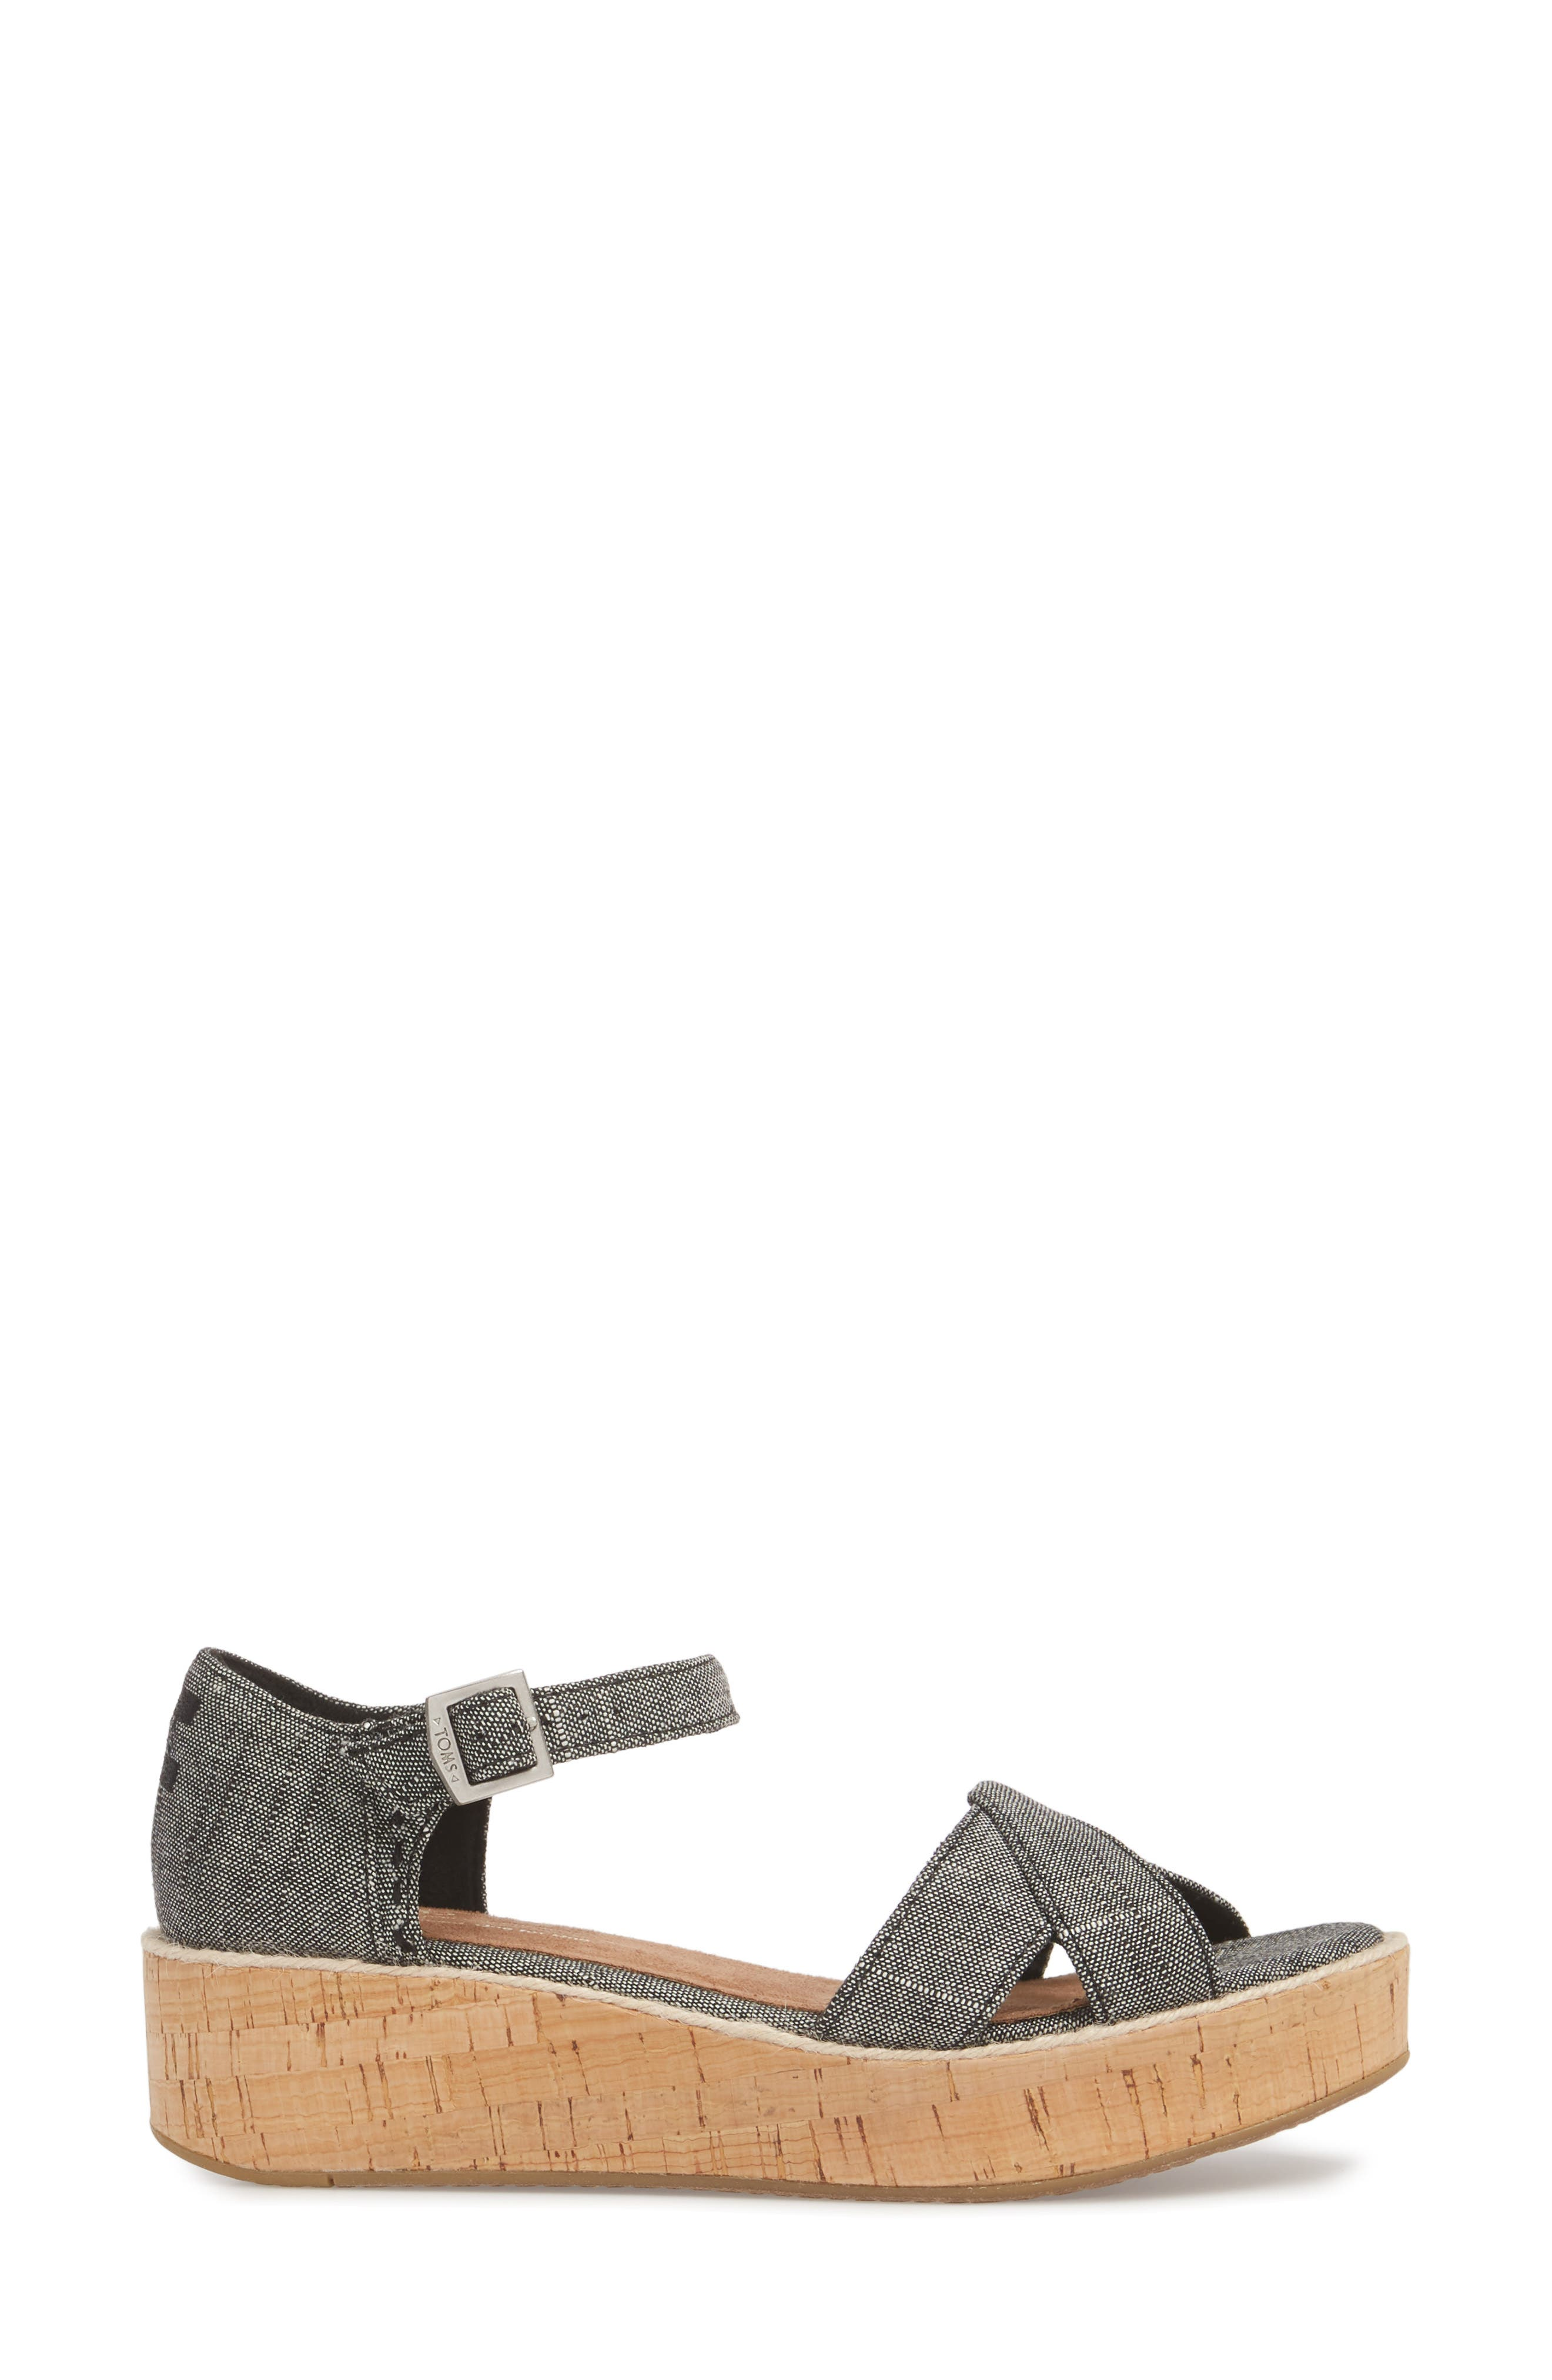 Harper Platform Sandal,                             Alternate thumbnail 5, color,